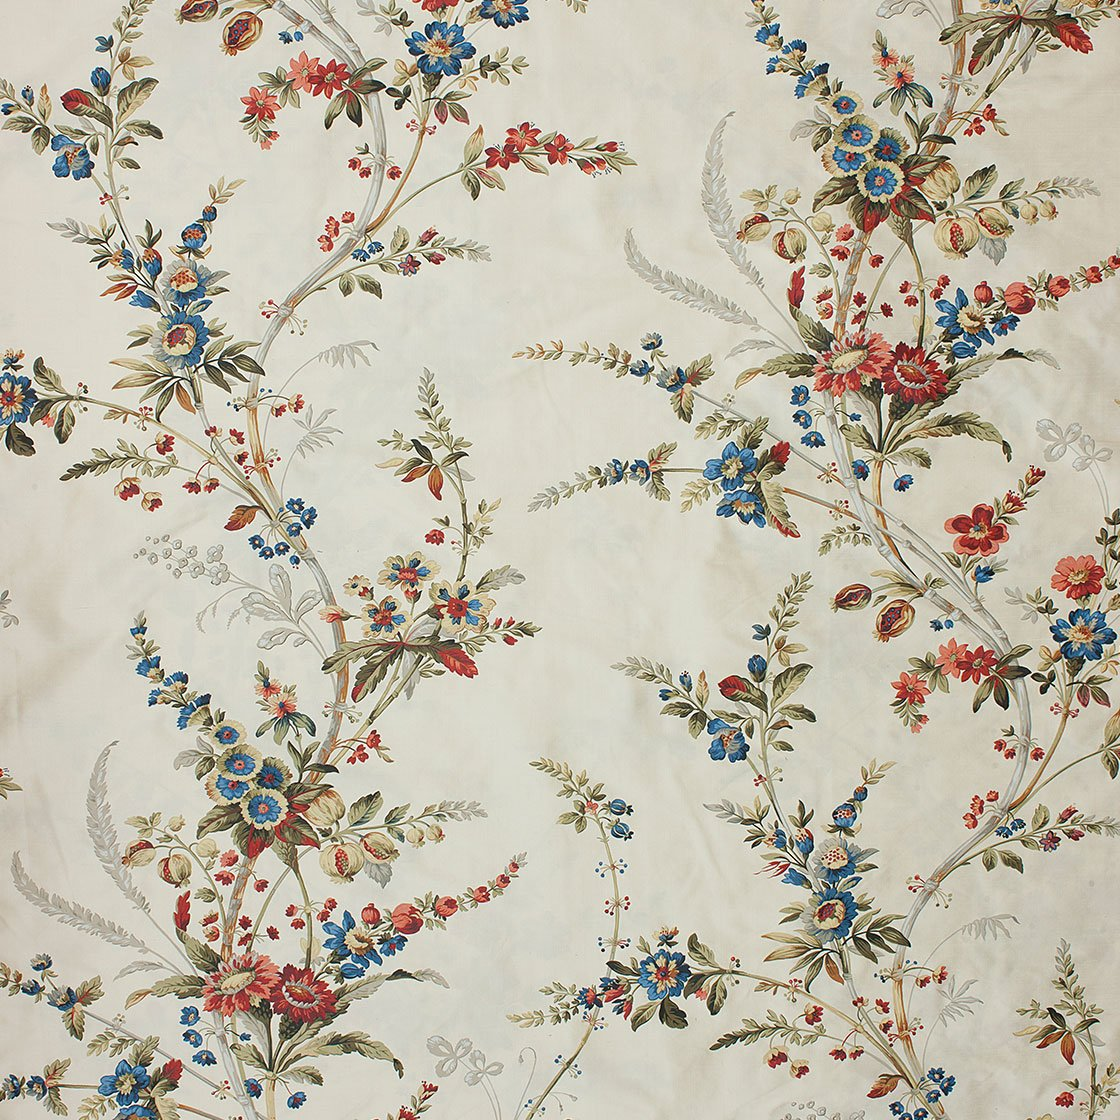 Amelia Printed Silk - Ivory Meadow - Beaumont & Fletcher - Beaumont & Fletcher